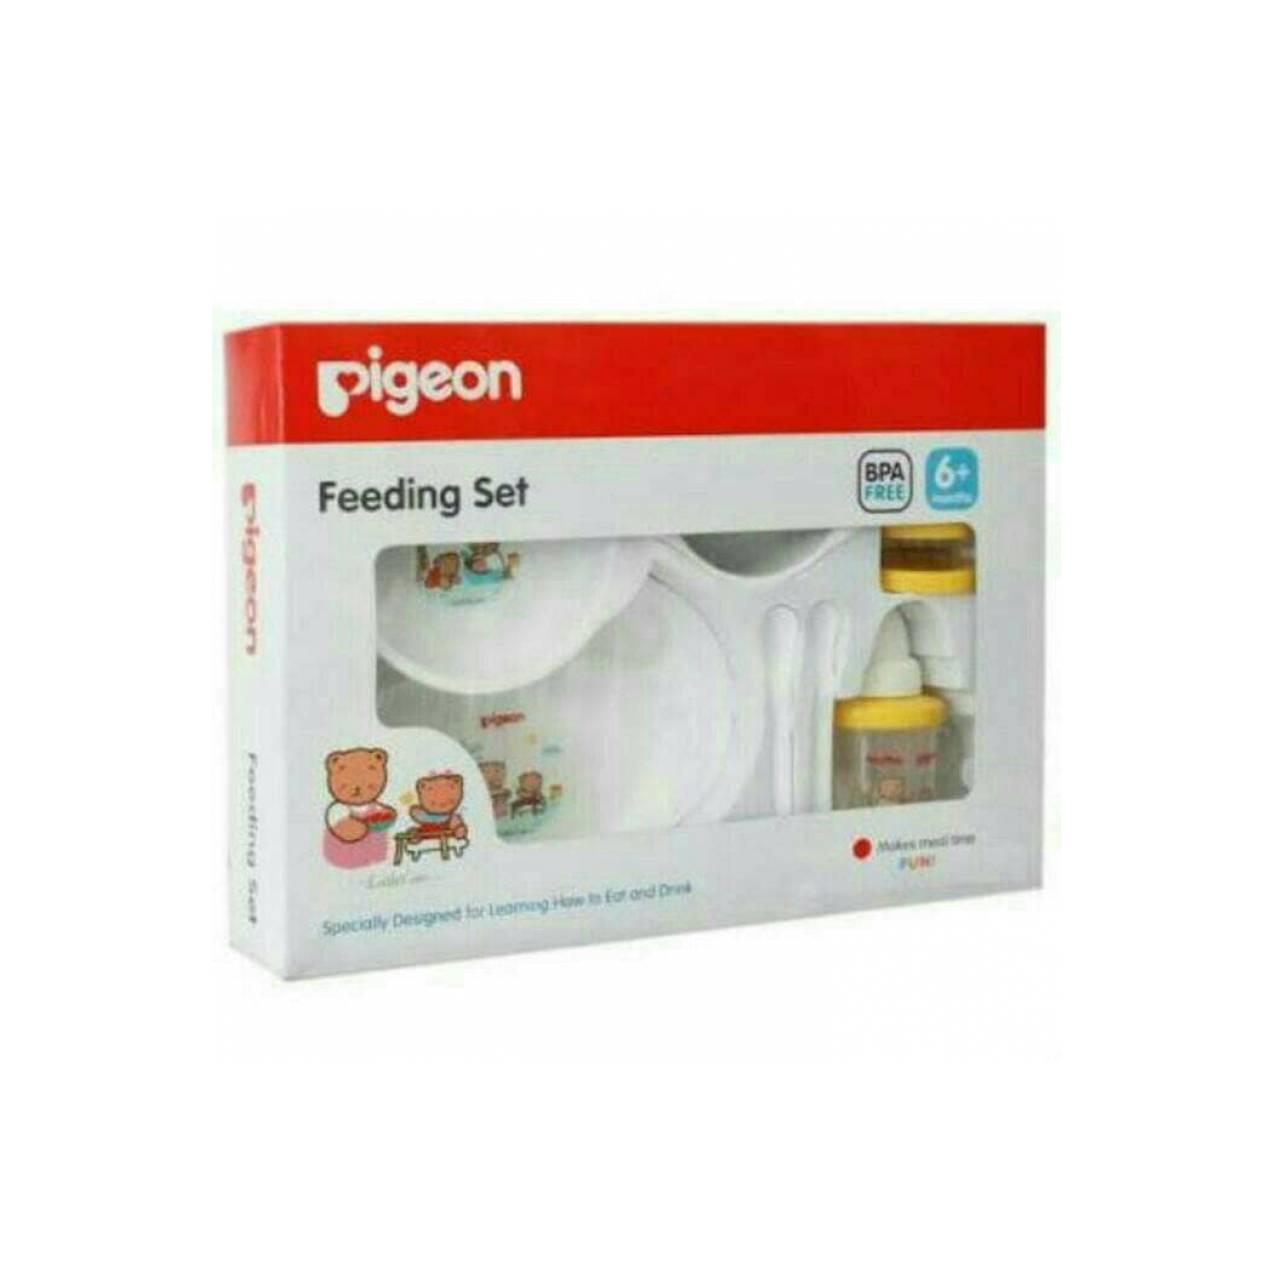 Pigeon Feeding Set komplit with training cup Tempat Makan Bayi Komplit a0ba41dd73